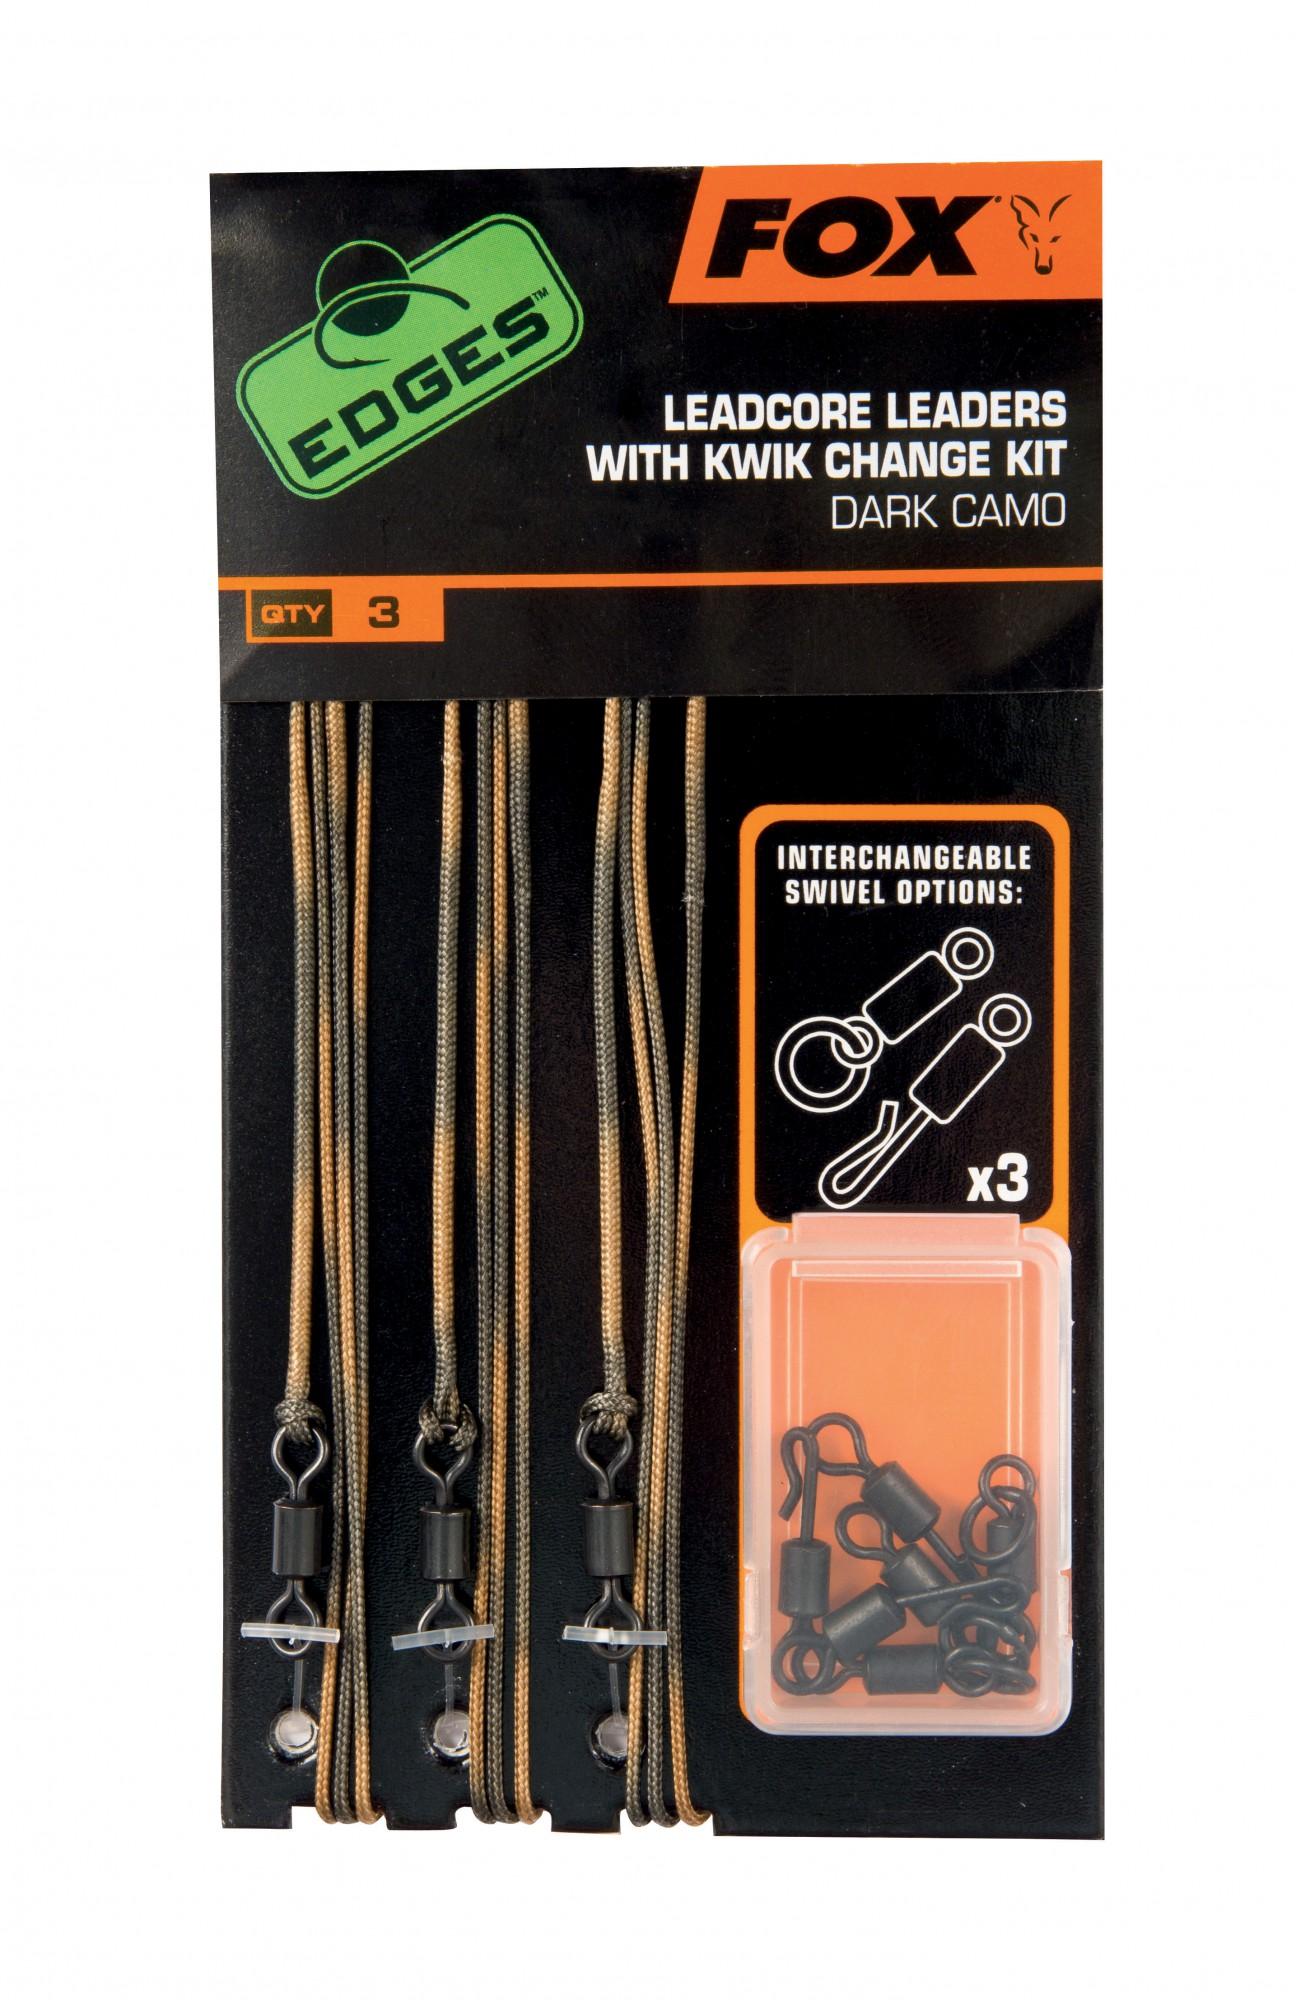 NEU Fox Edges Lead Clip Leadcore Leaders 2 Farben Dark oder Light Camo